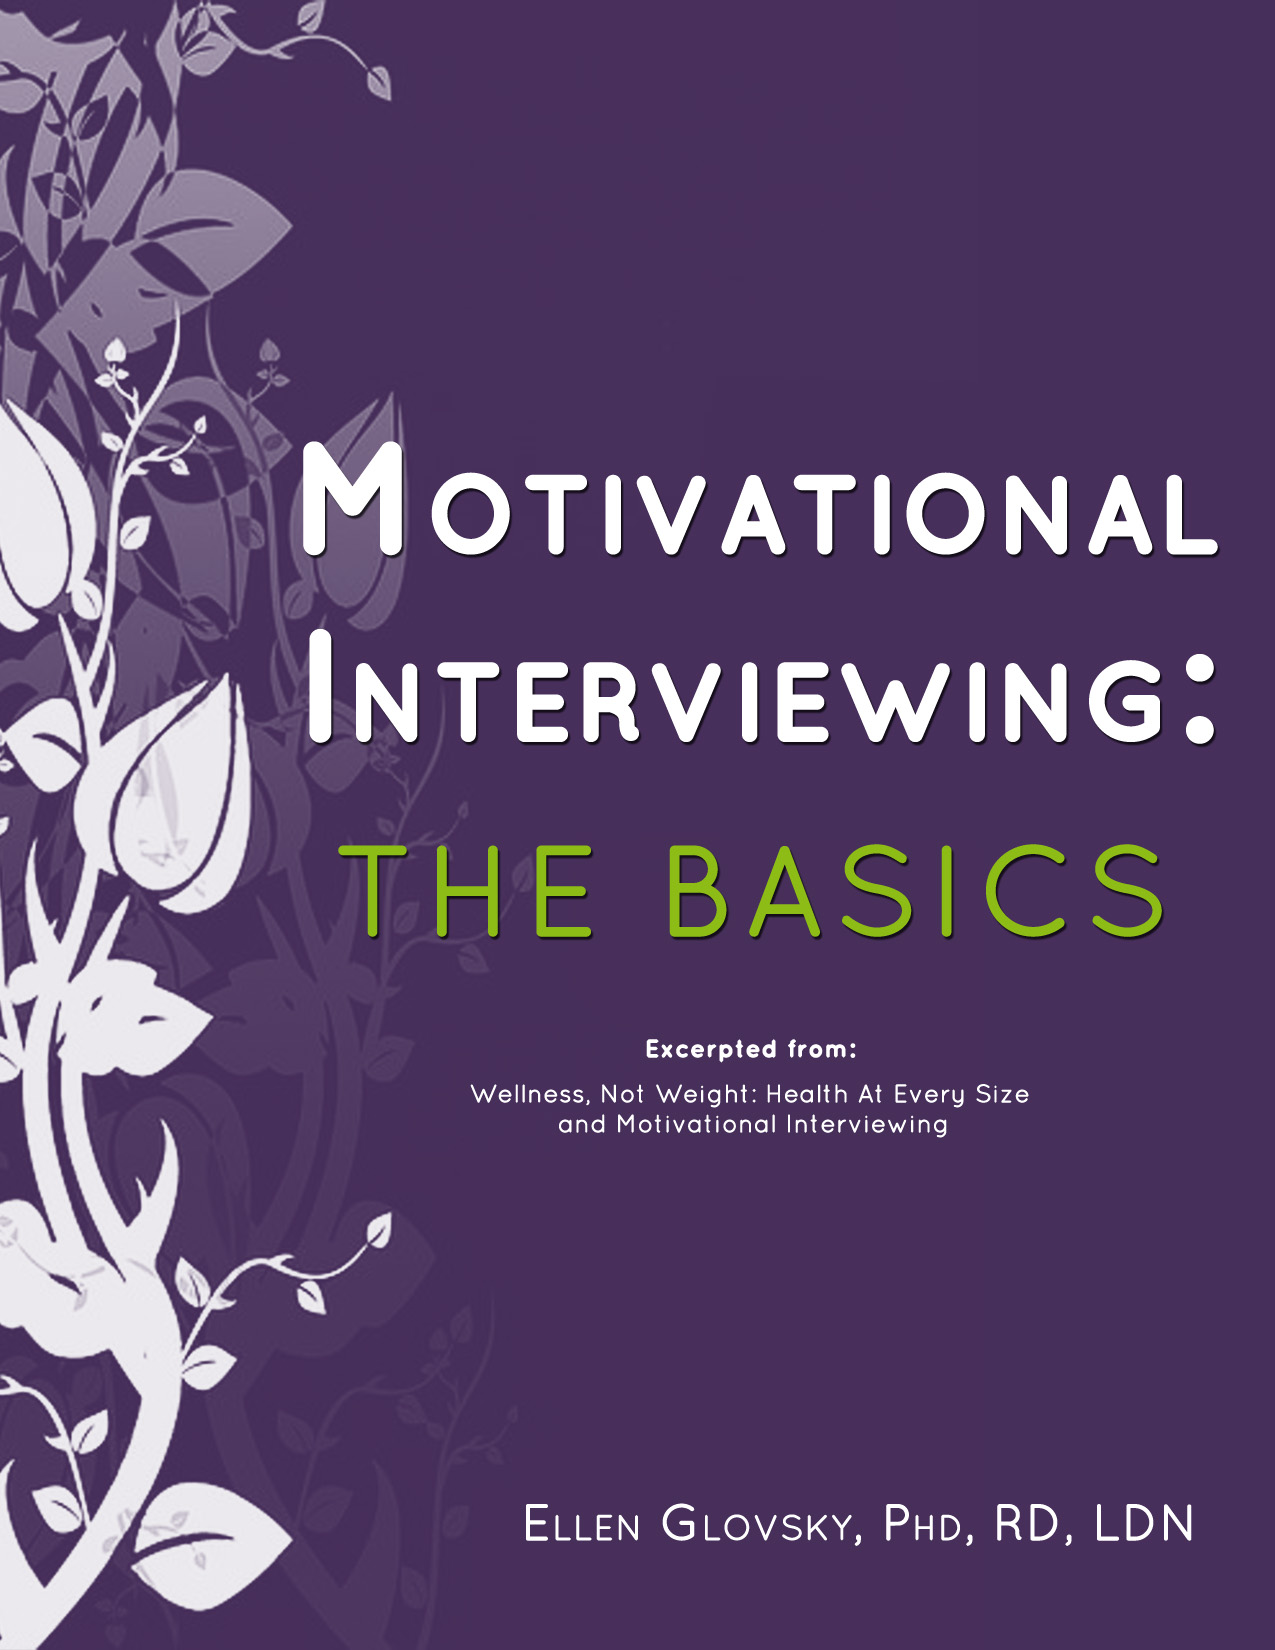 Motivational Interviewing: The Basics